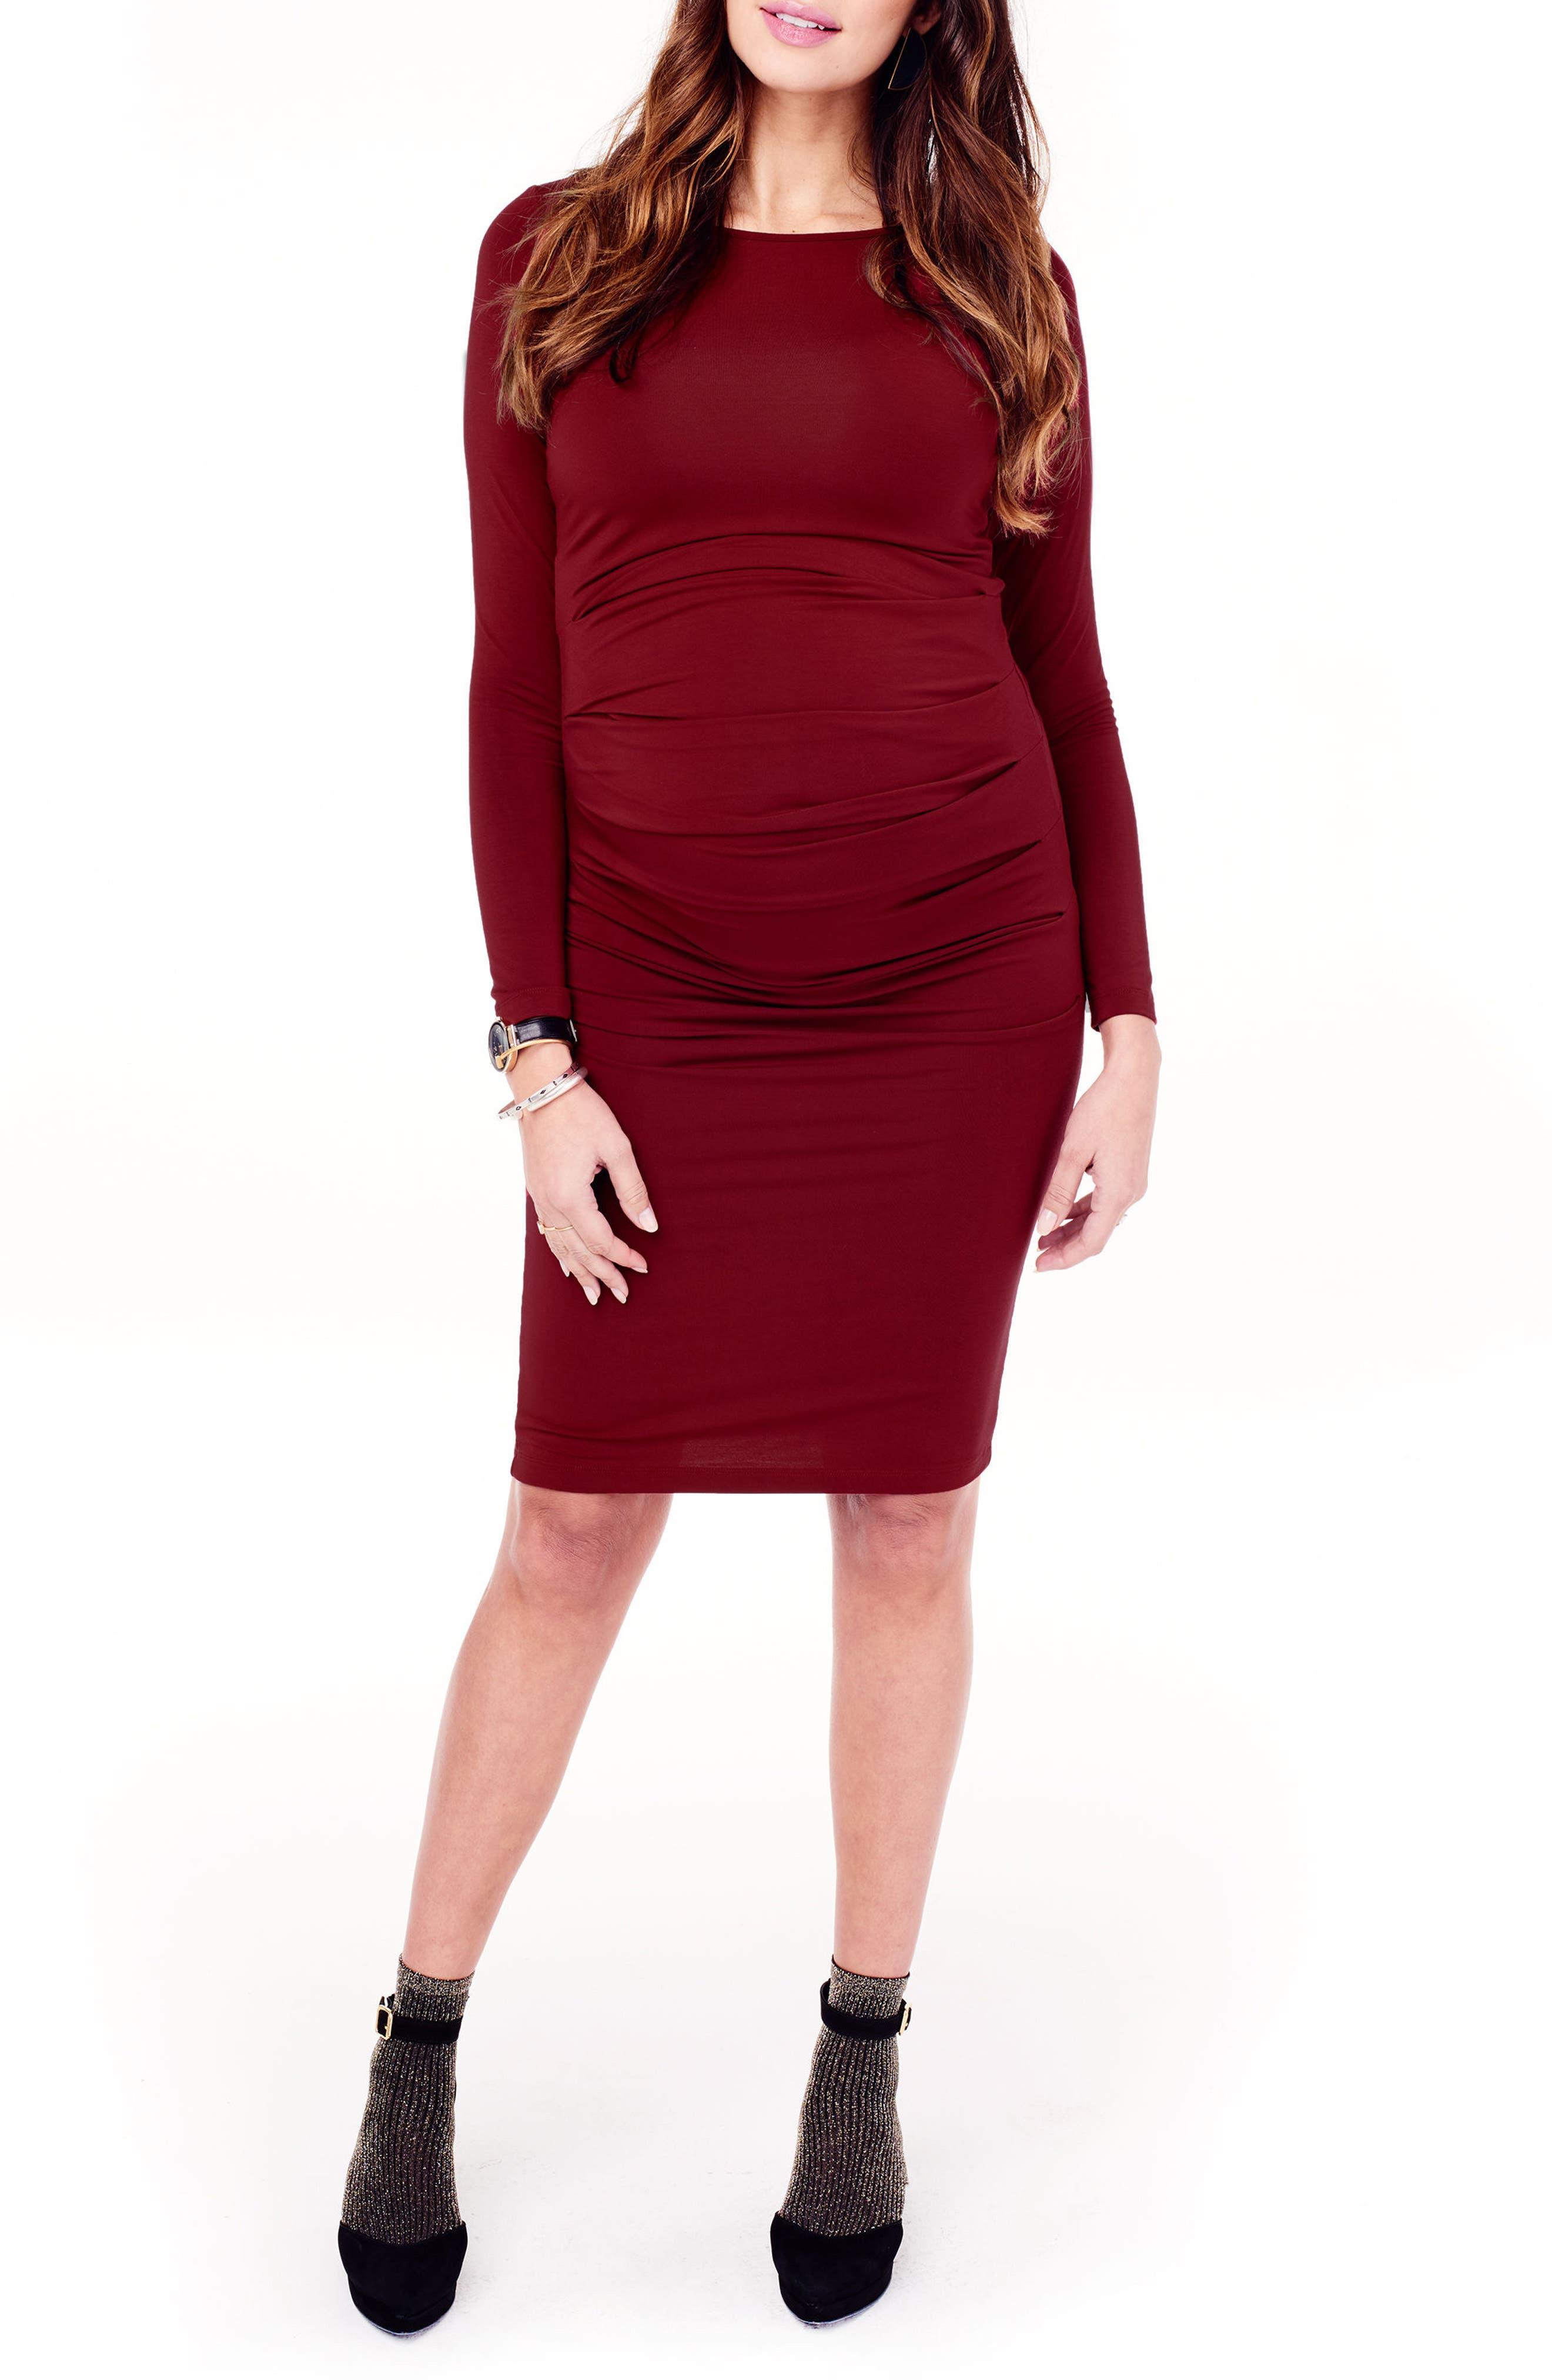 Alternate Image 1 Selected - Ingrid & Isabel® Shirred Maternity Dress